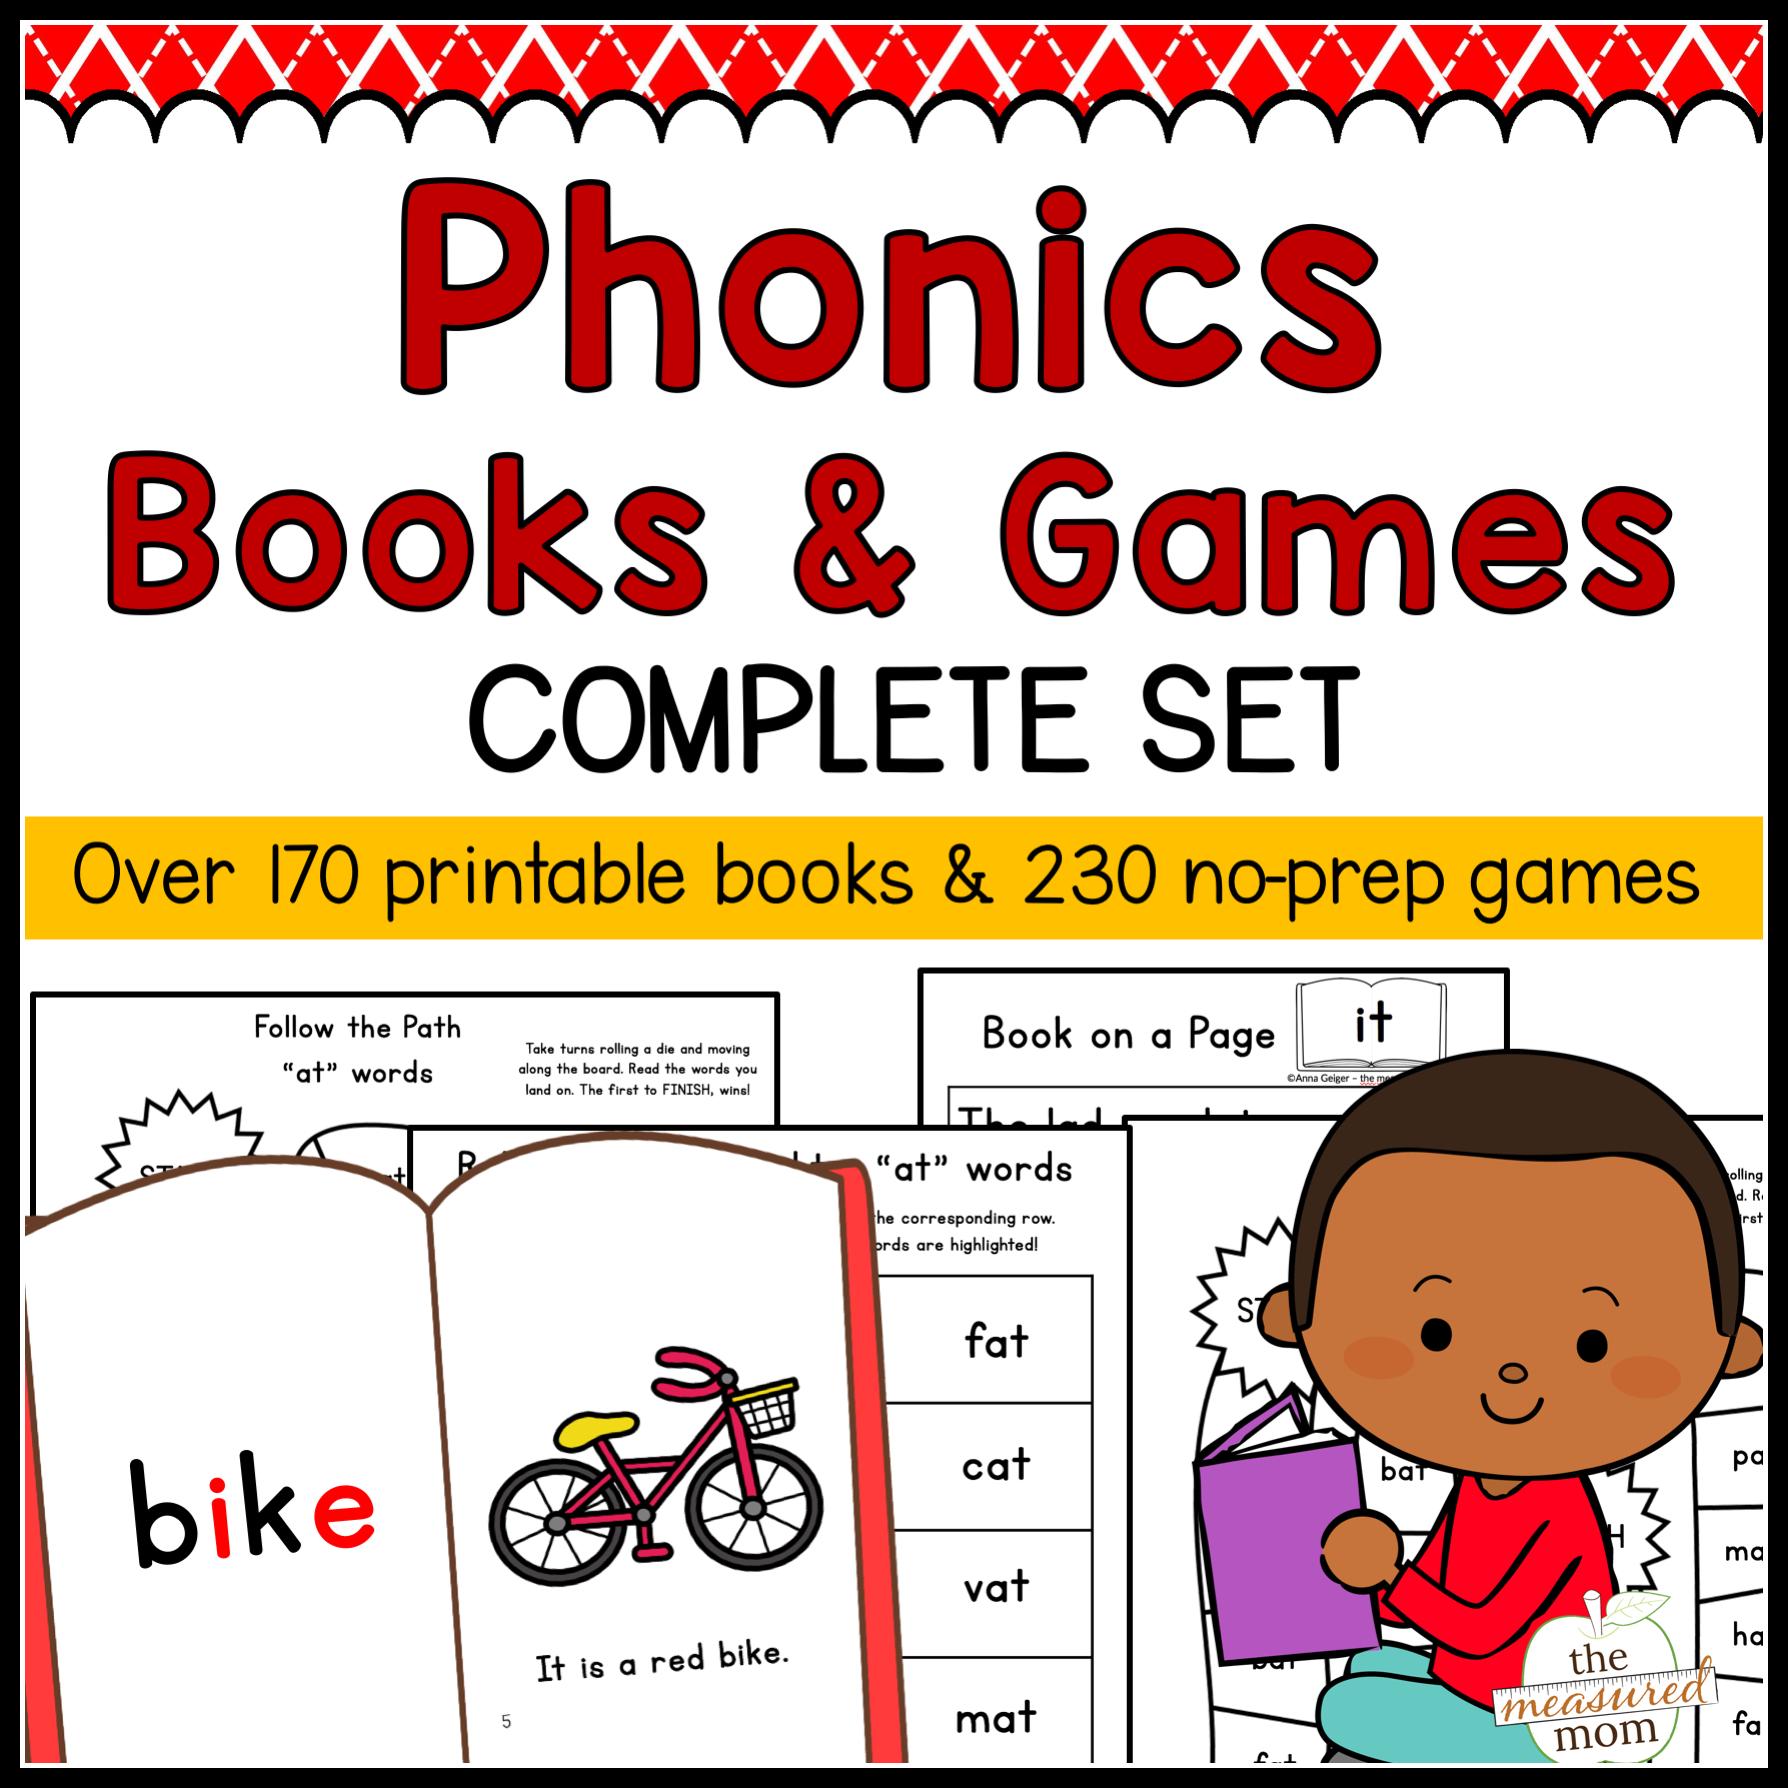 Phonics Books & Games - Complete Set - The Measured Mom - Free Printable Phonics Books For Kindergarten